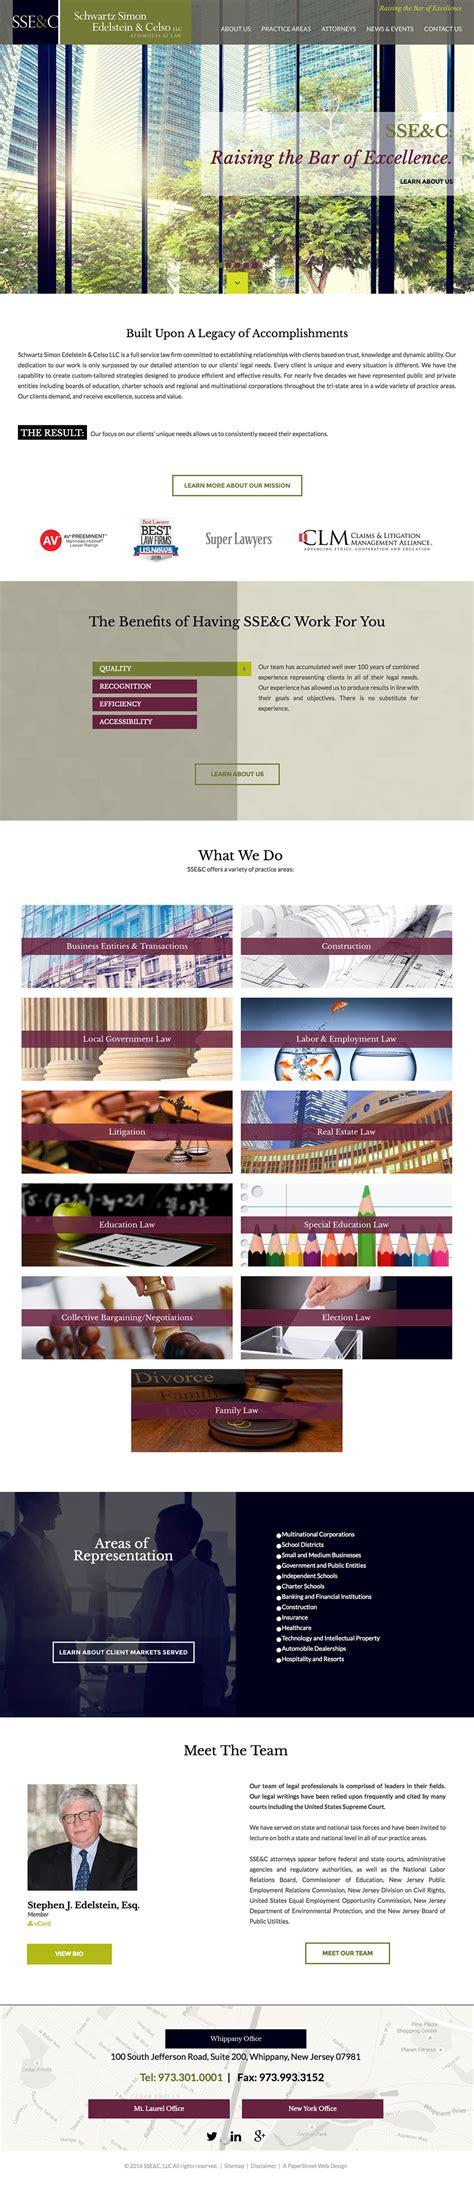 website layout inspiration 2016 law firm website design inspiration for 2016 paperstreet